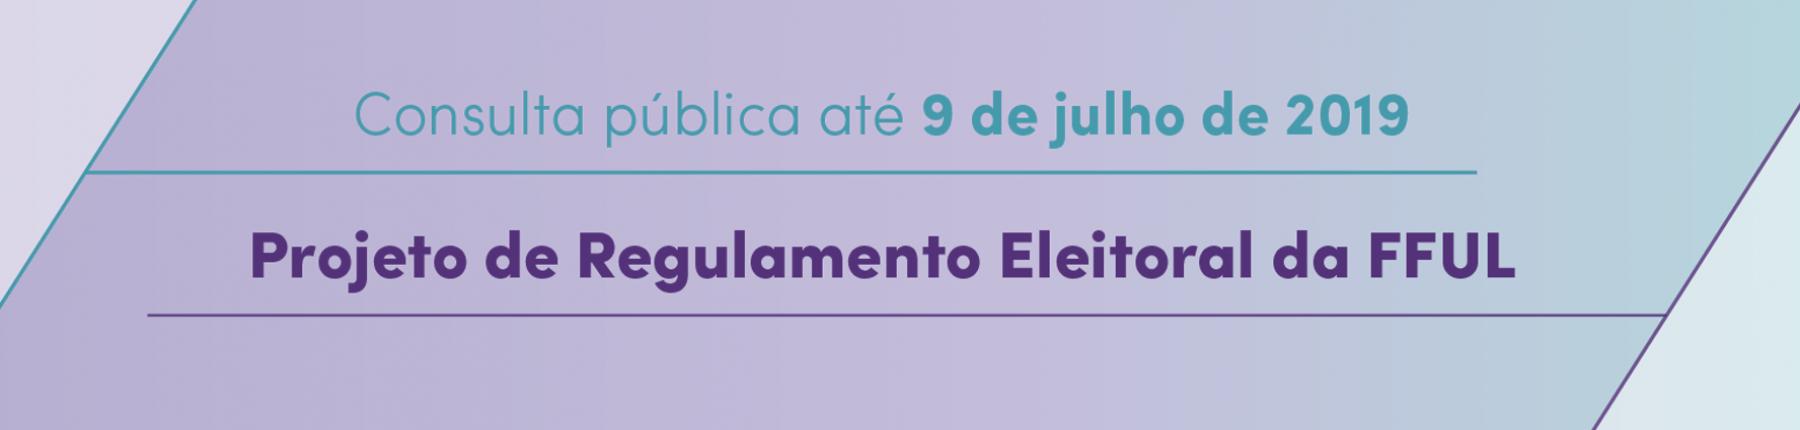 https://www.ff.ulisboa.pt/wp-content/uploads/2019/05/projetoRegulamentoBanner-site--375x430.png